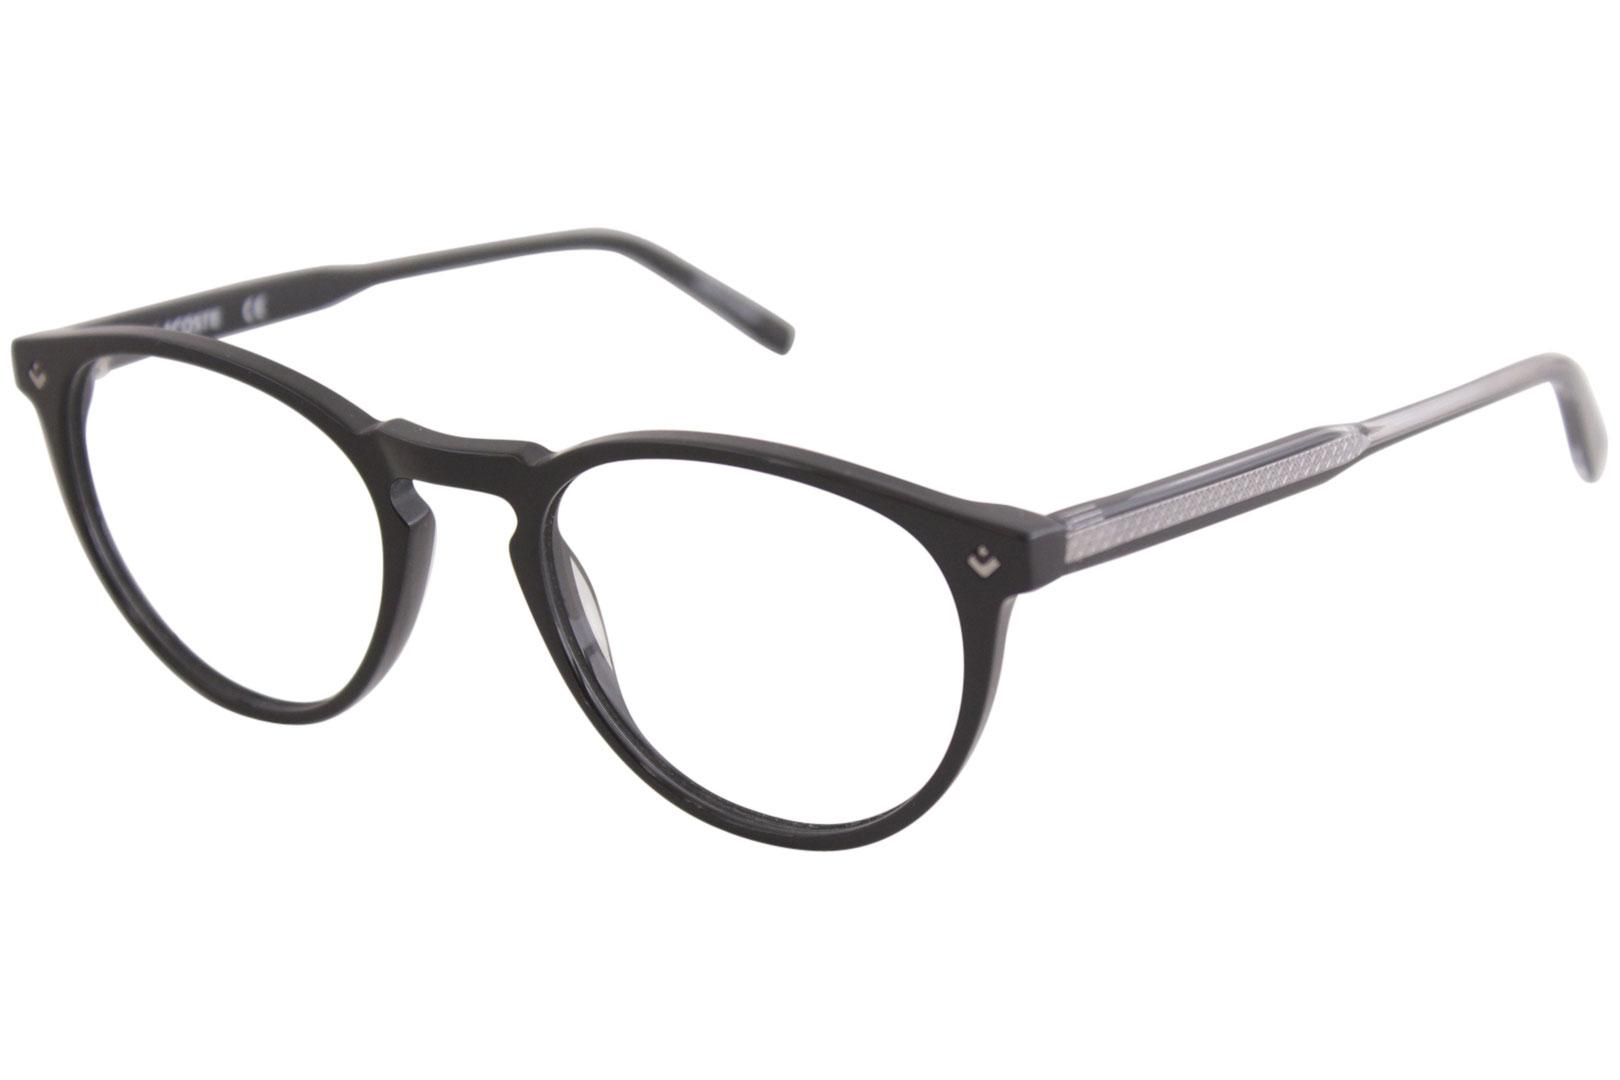 8ecaa143cfe8 Lacoste Men s Eyeglasses Novak Djokovic L2601ND L 2601 ND Full Rim Optical  Frame